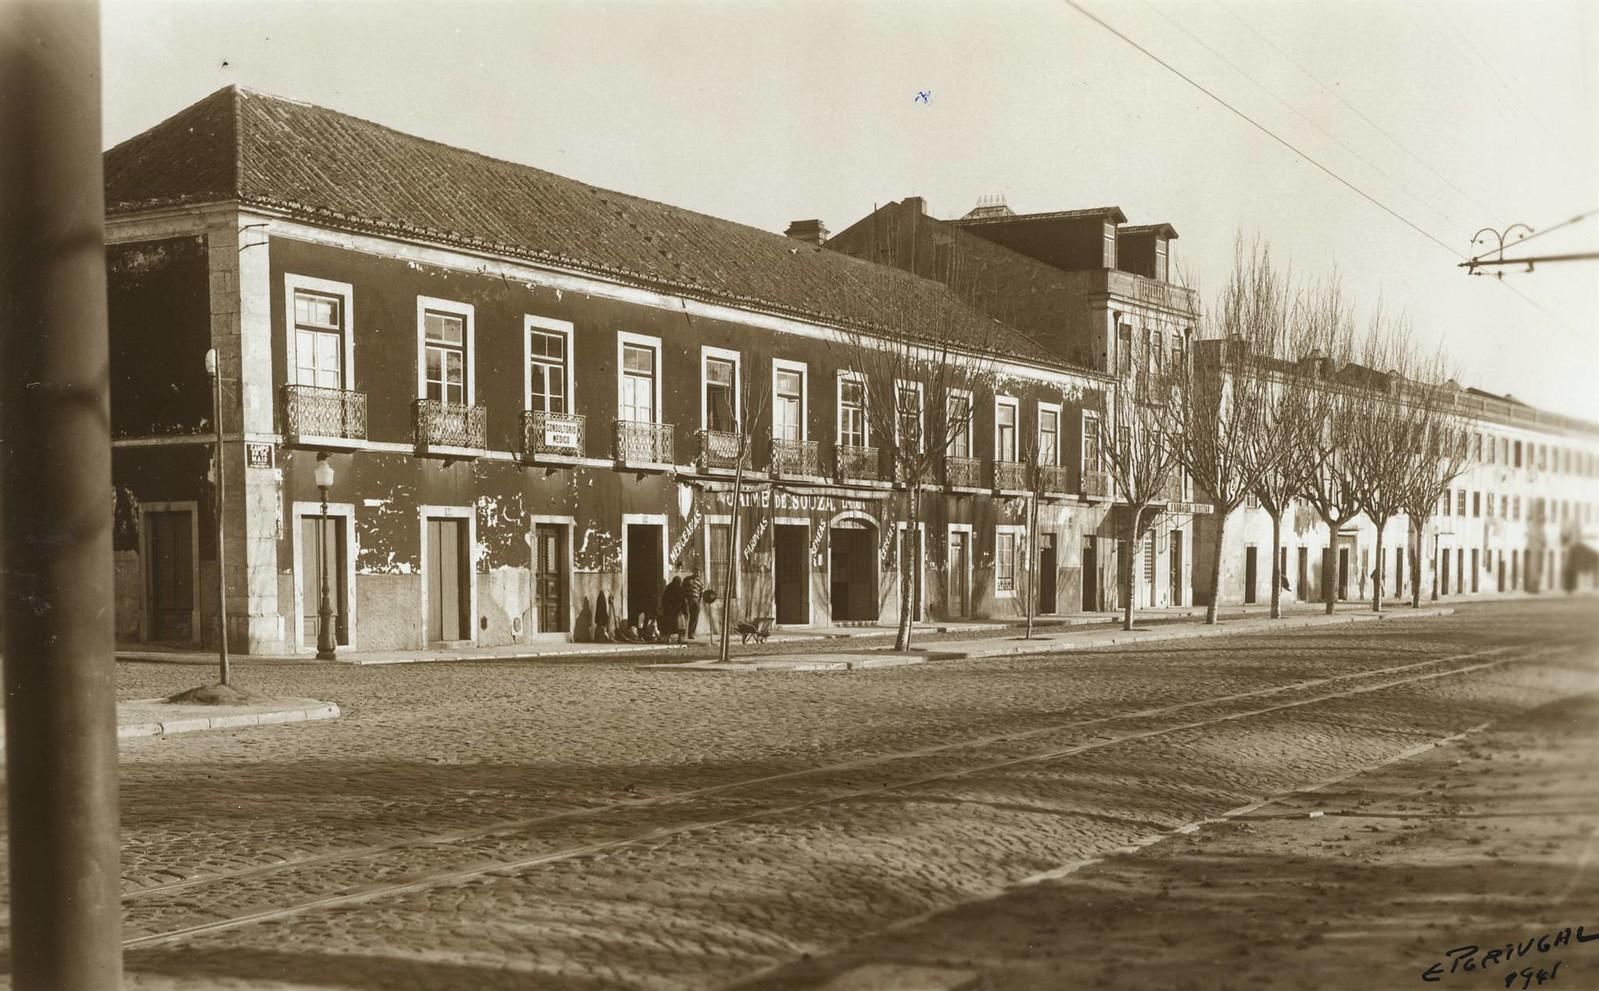 Campo Grande, Lisboa (E.Portugal, 1941)